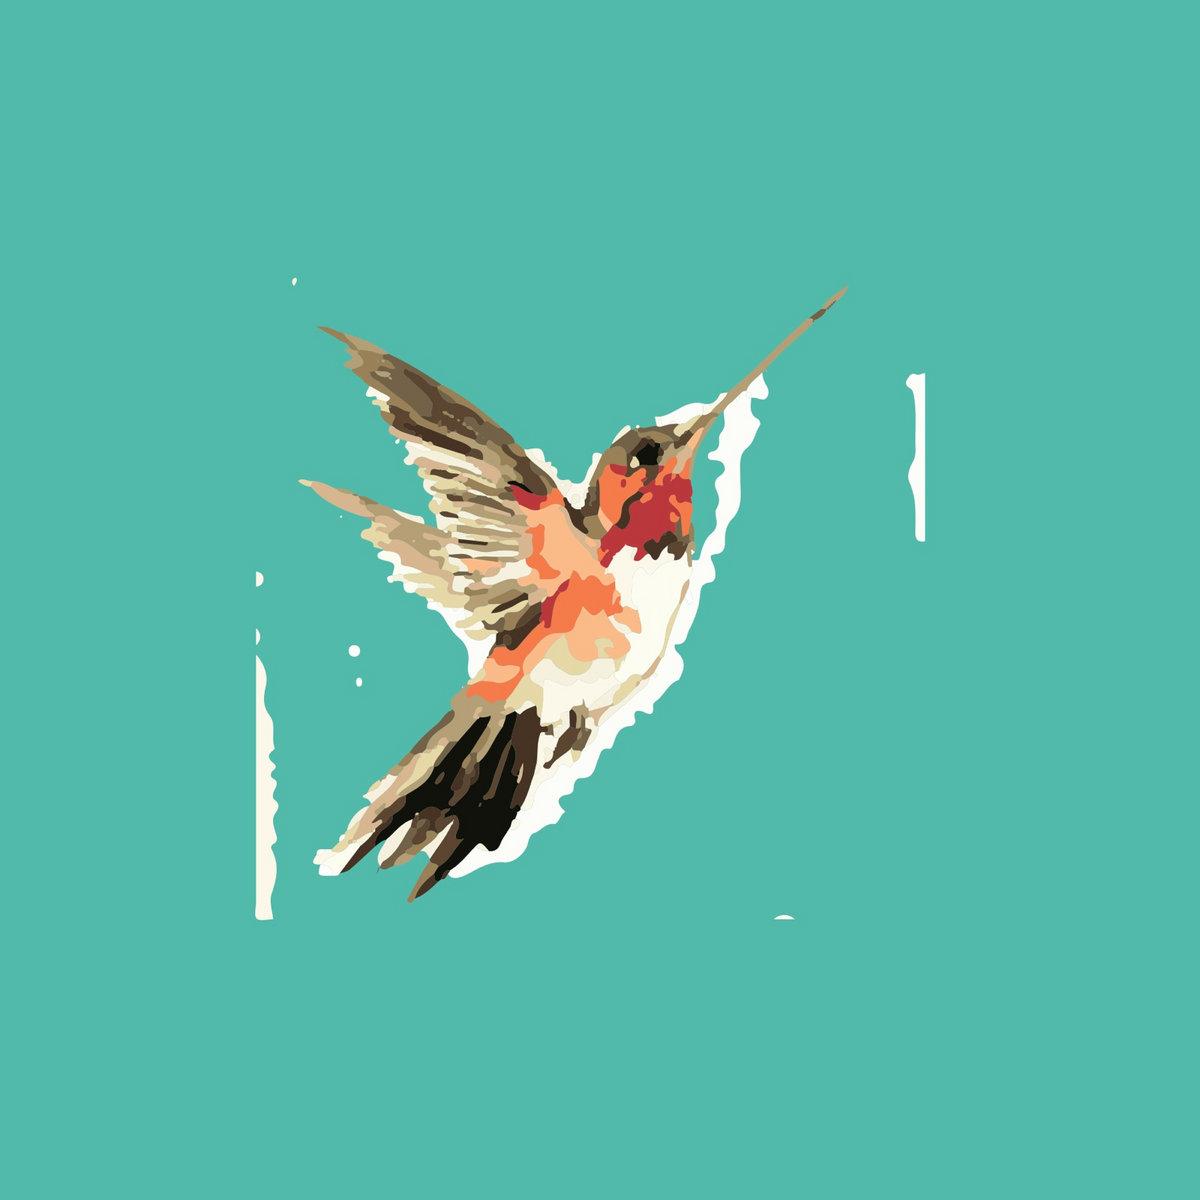 Hummingbird by Thames